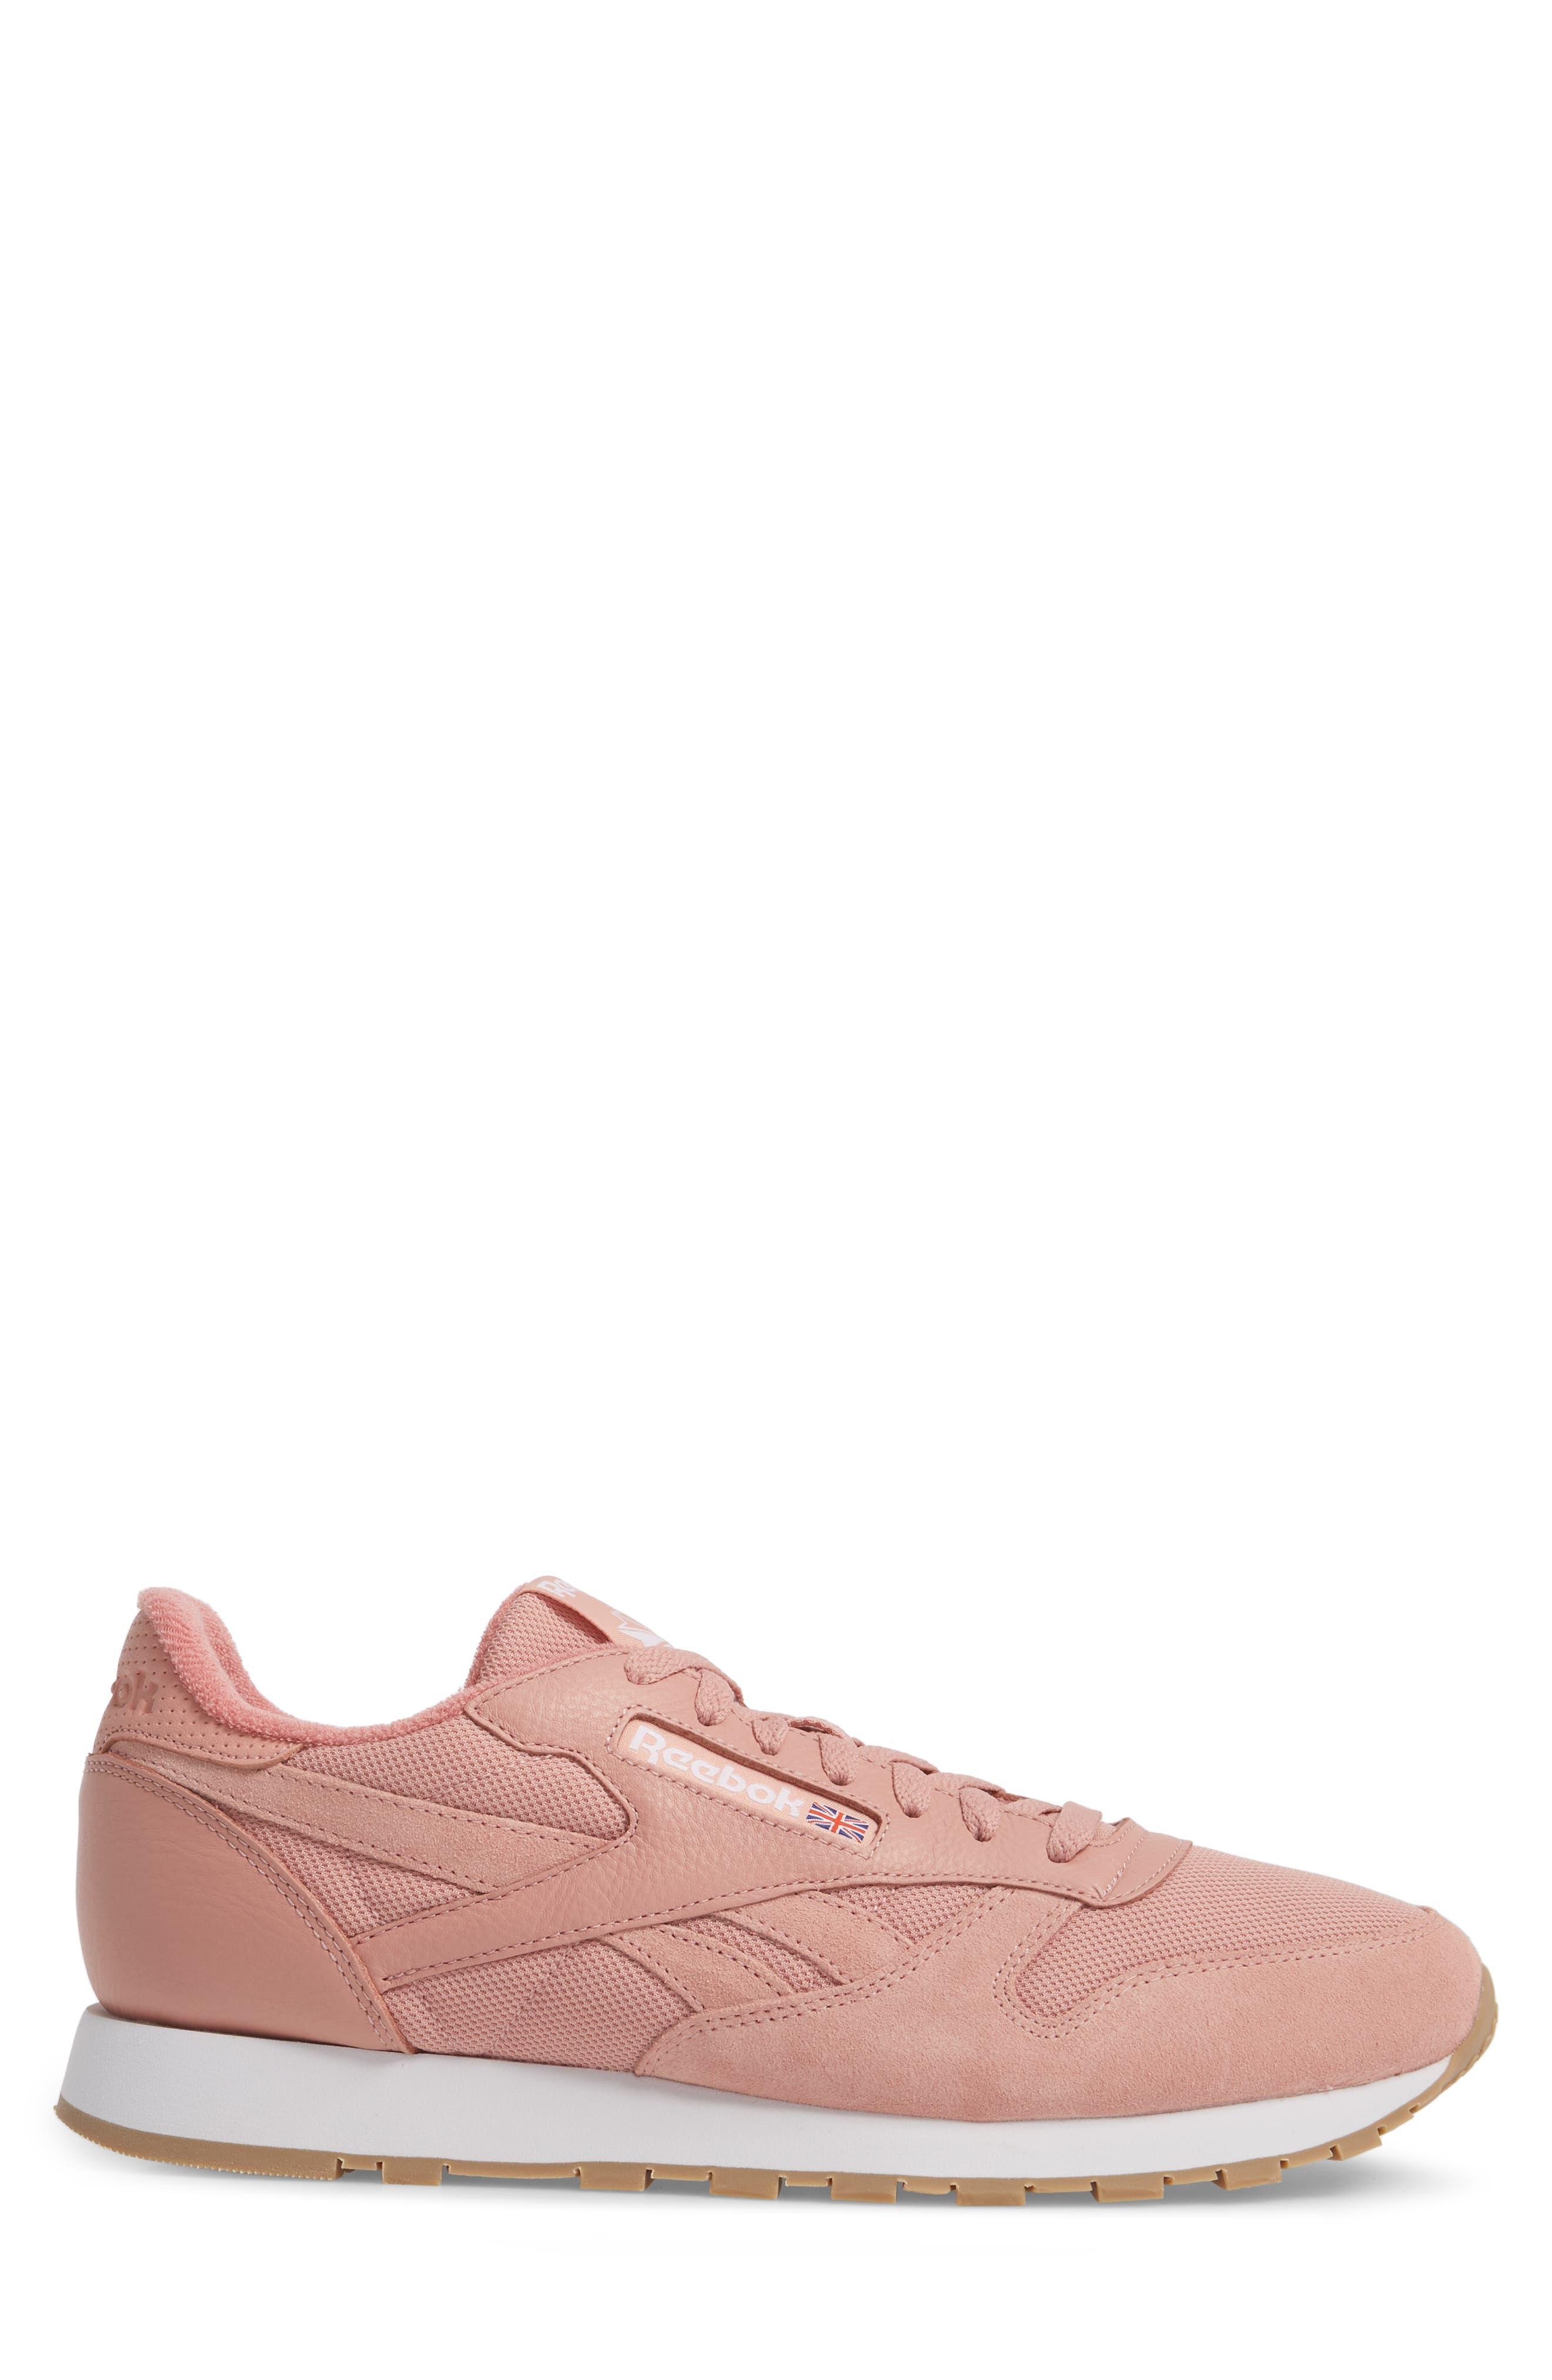 ESTL Classic Leather Sneaker,                             Alternate thumbnail 3, color,                             CHALK PINK/ WHITE